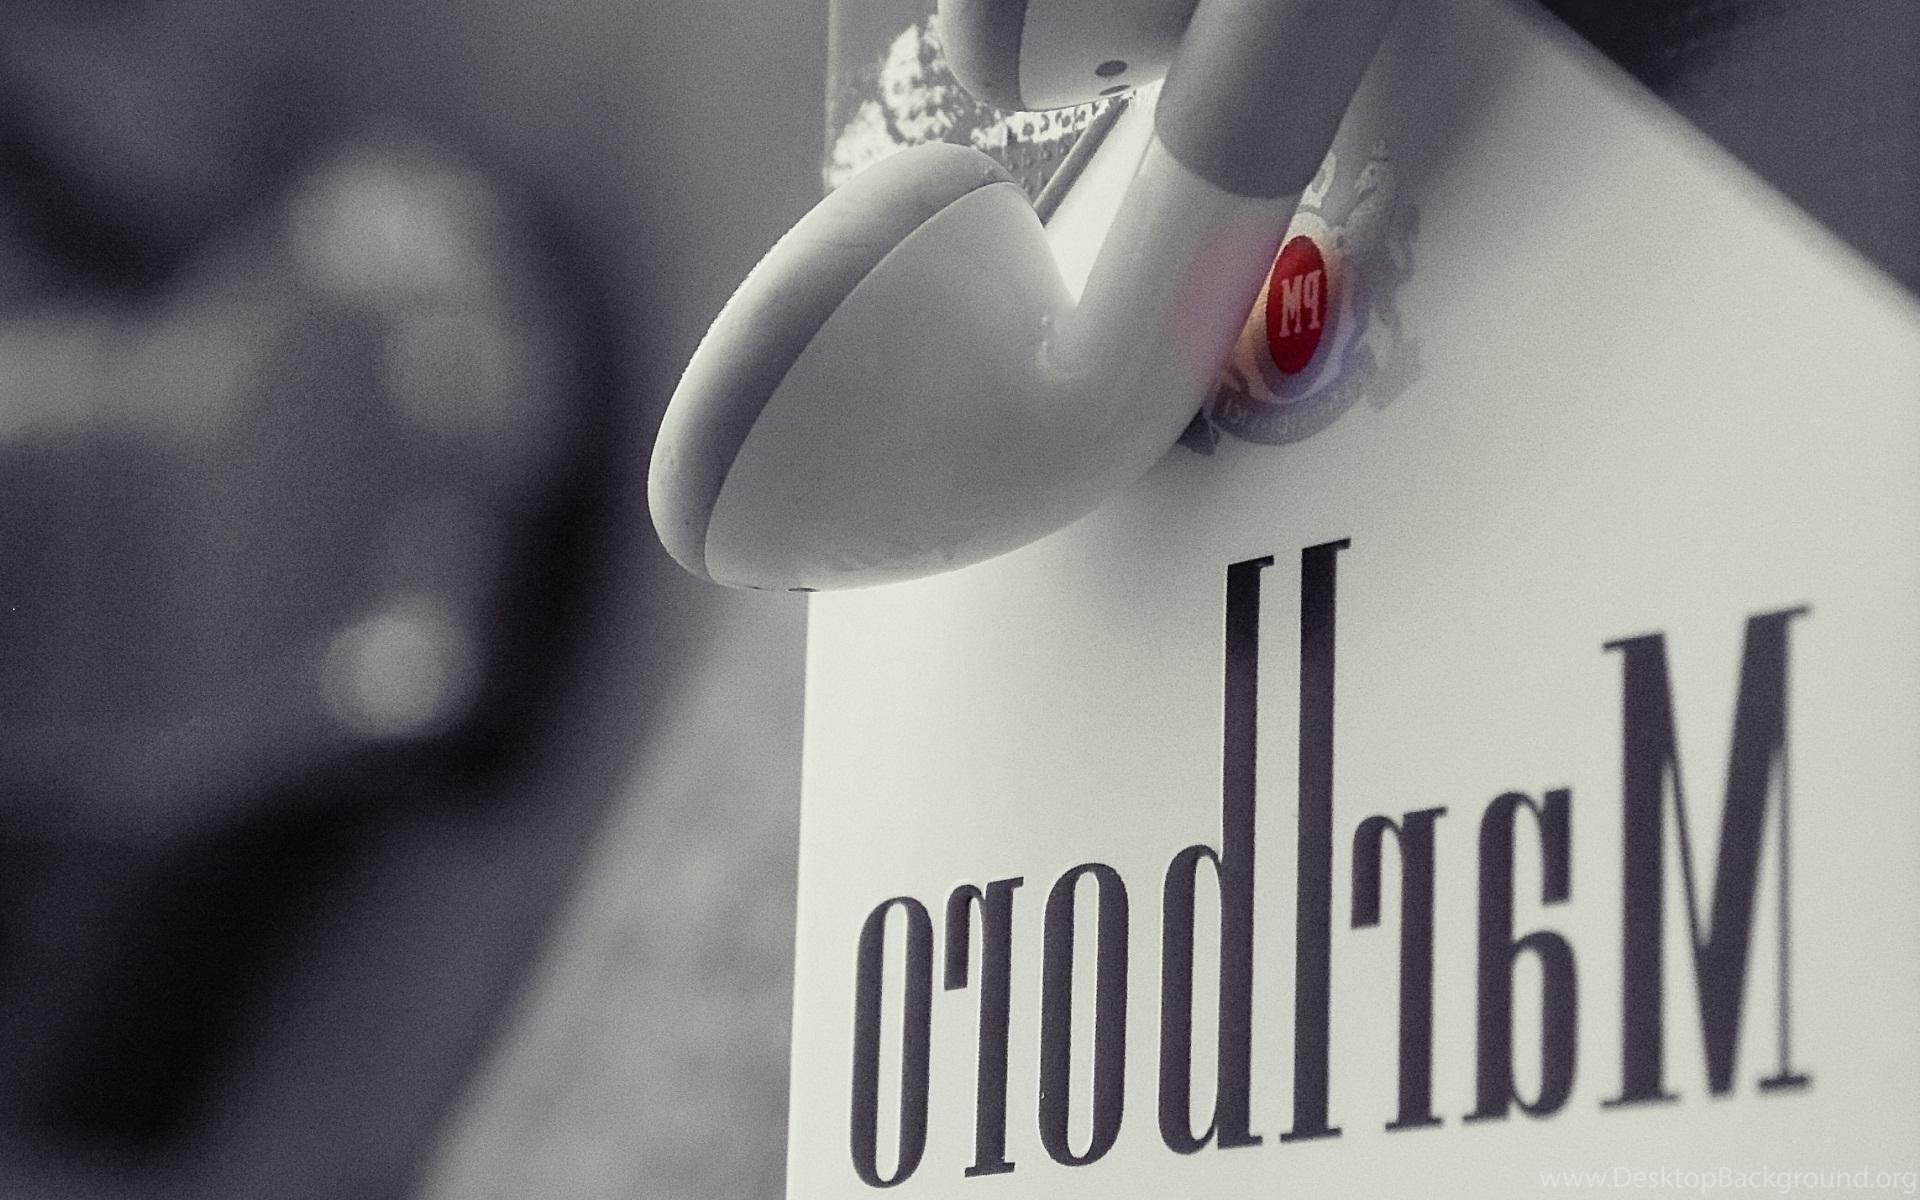 Marlboro Cigarettes Apple Headphones Brand Hd Wallpapers Desktop